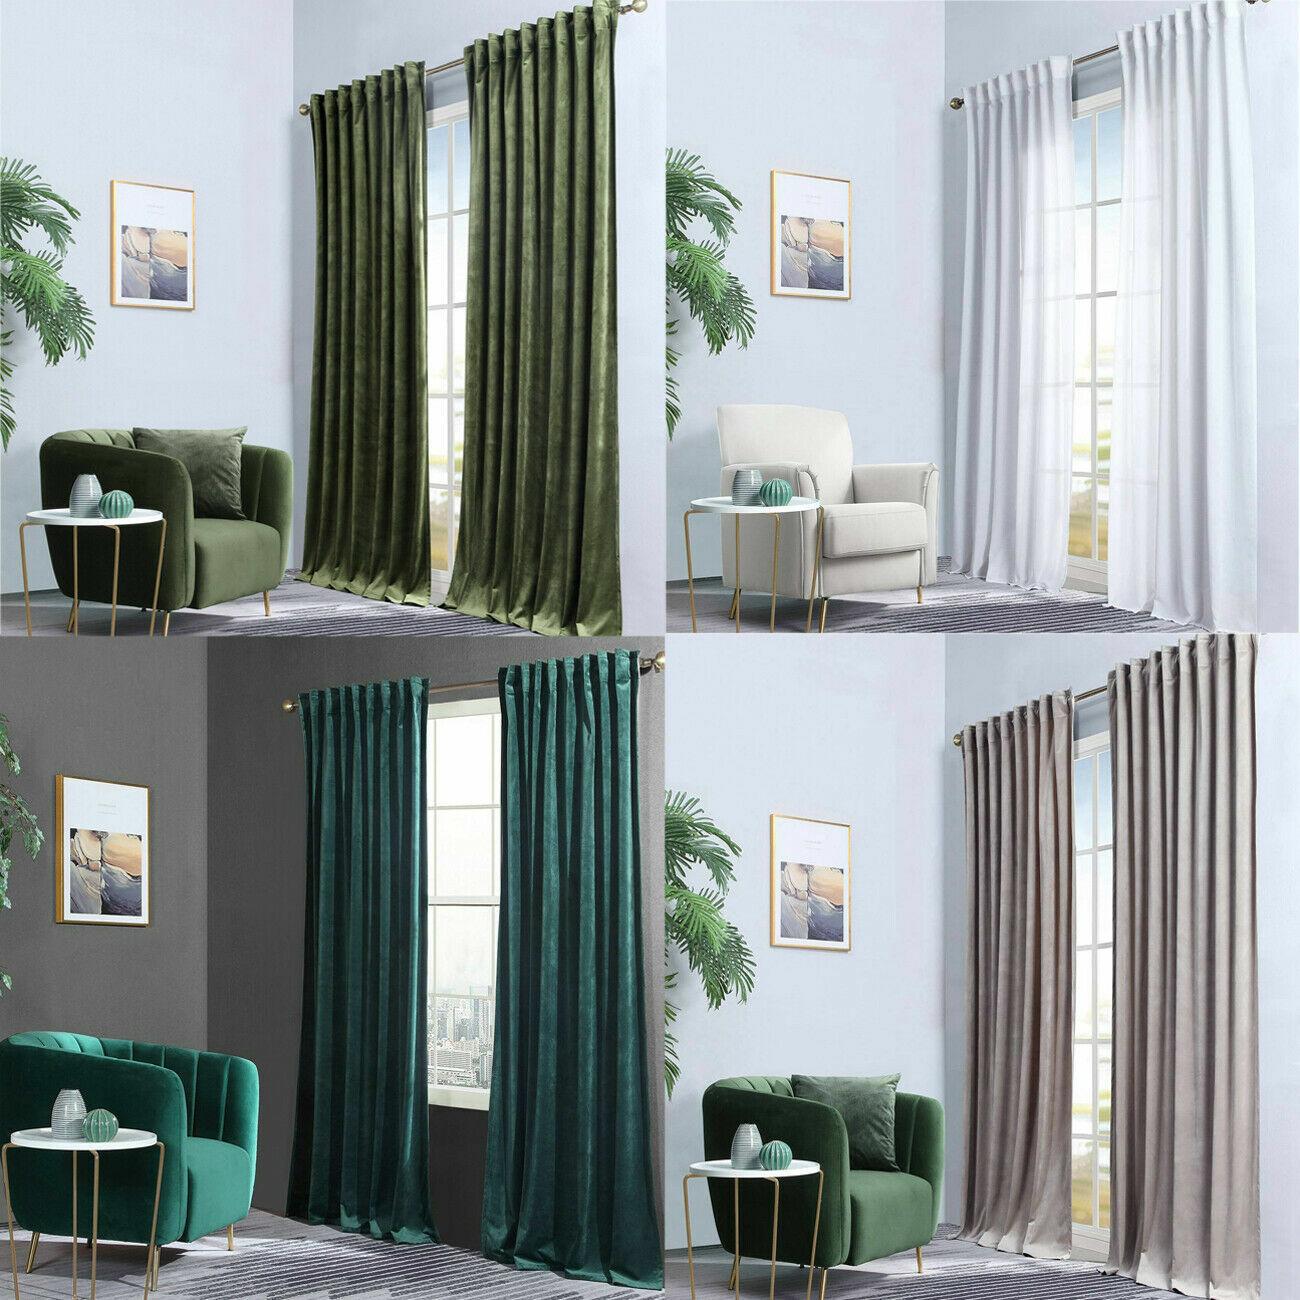 Large Bay Window Curtain Voile Drape Panel For Living Room Bedroom For Sale Online Ebay